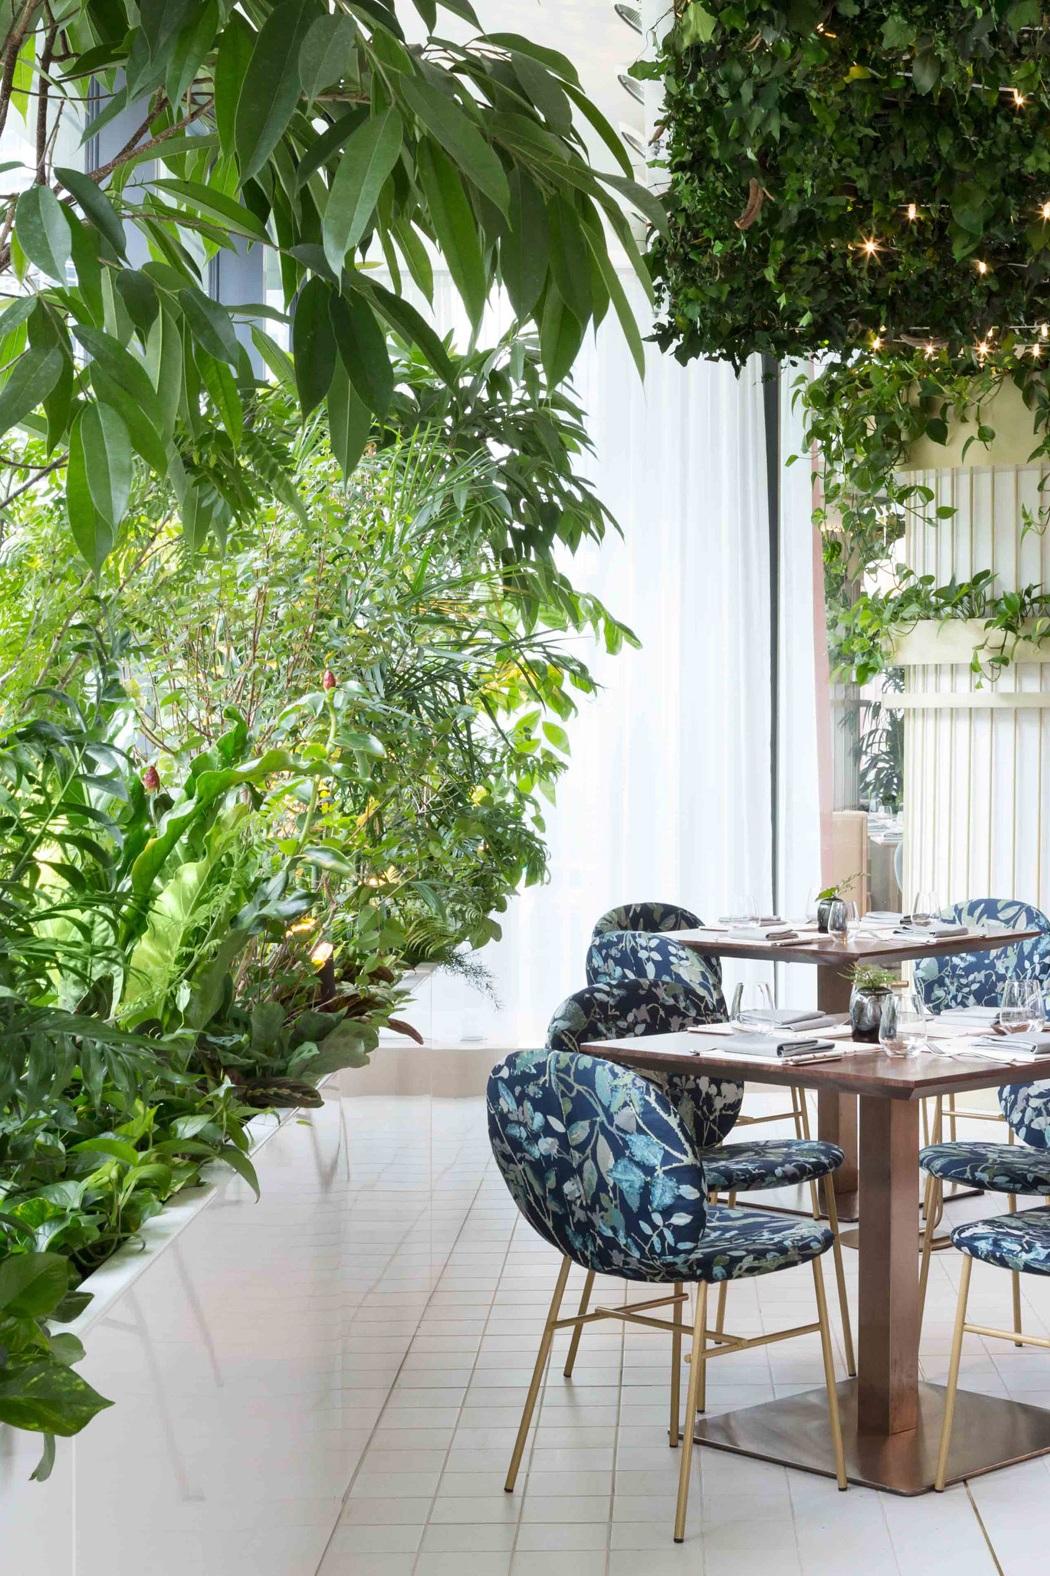 the-botanist-restaurant-fairmont-hotel-ste-marie-interiors-vancouver-canada_dezeen_2364_col_5.jpg